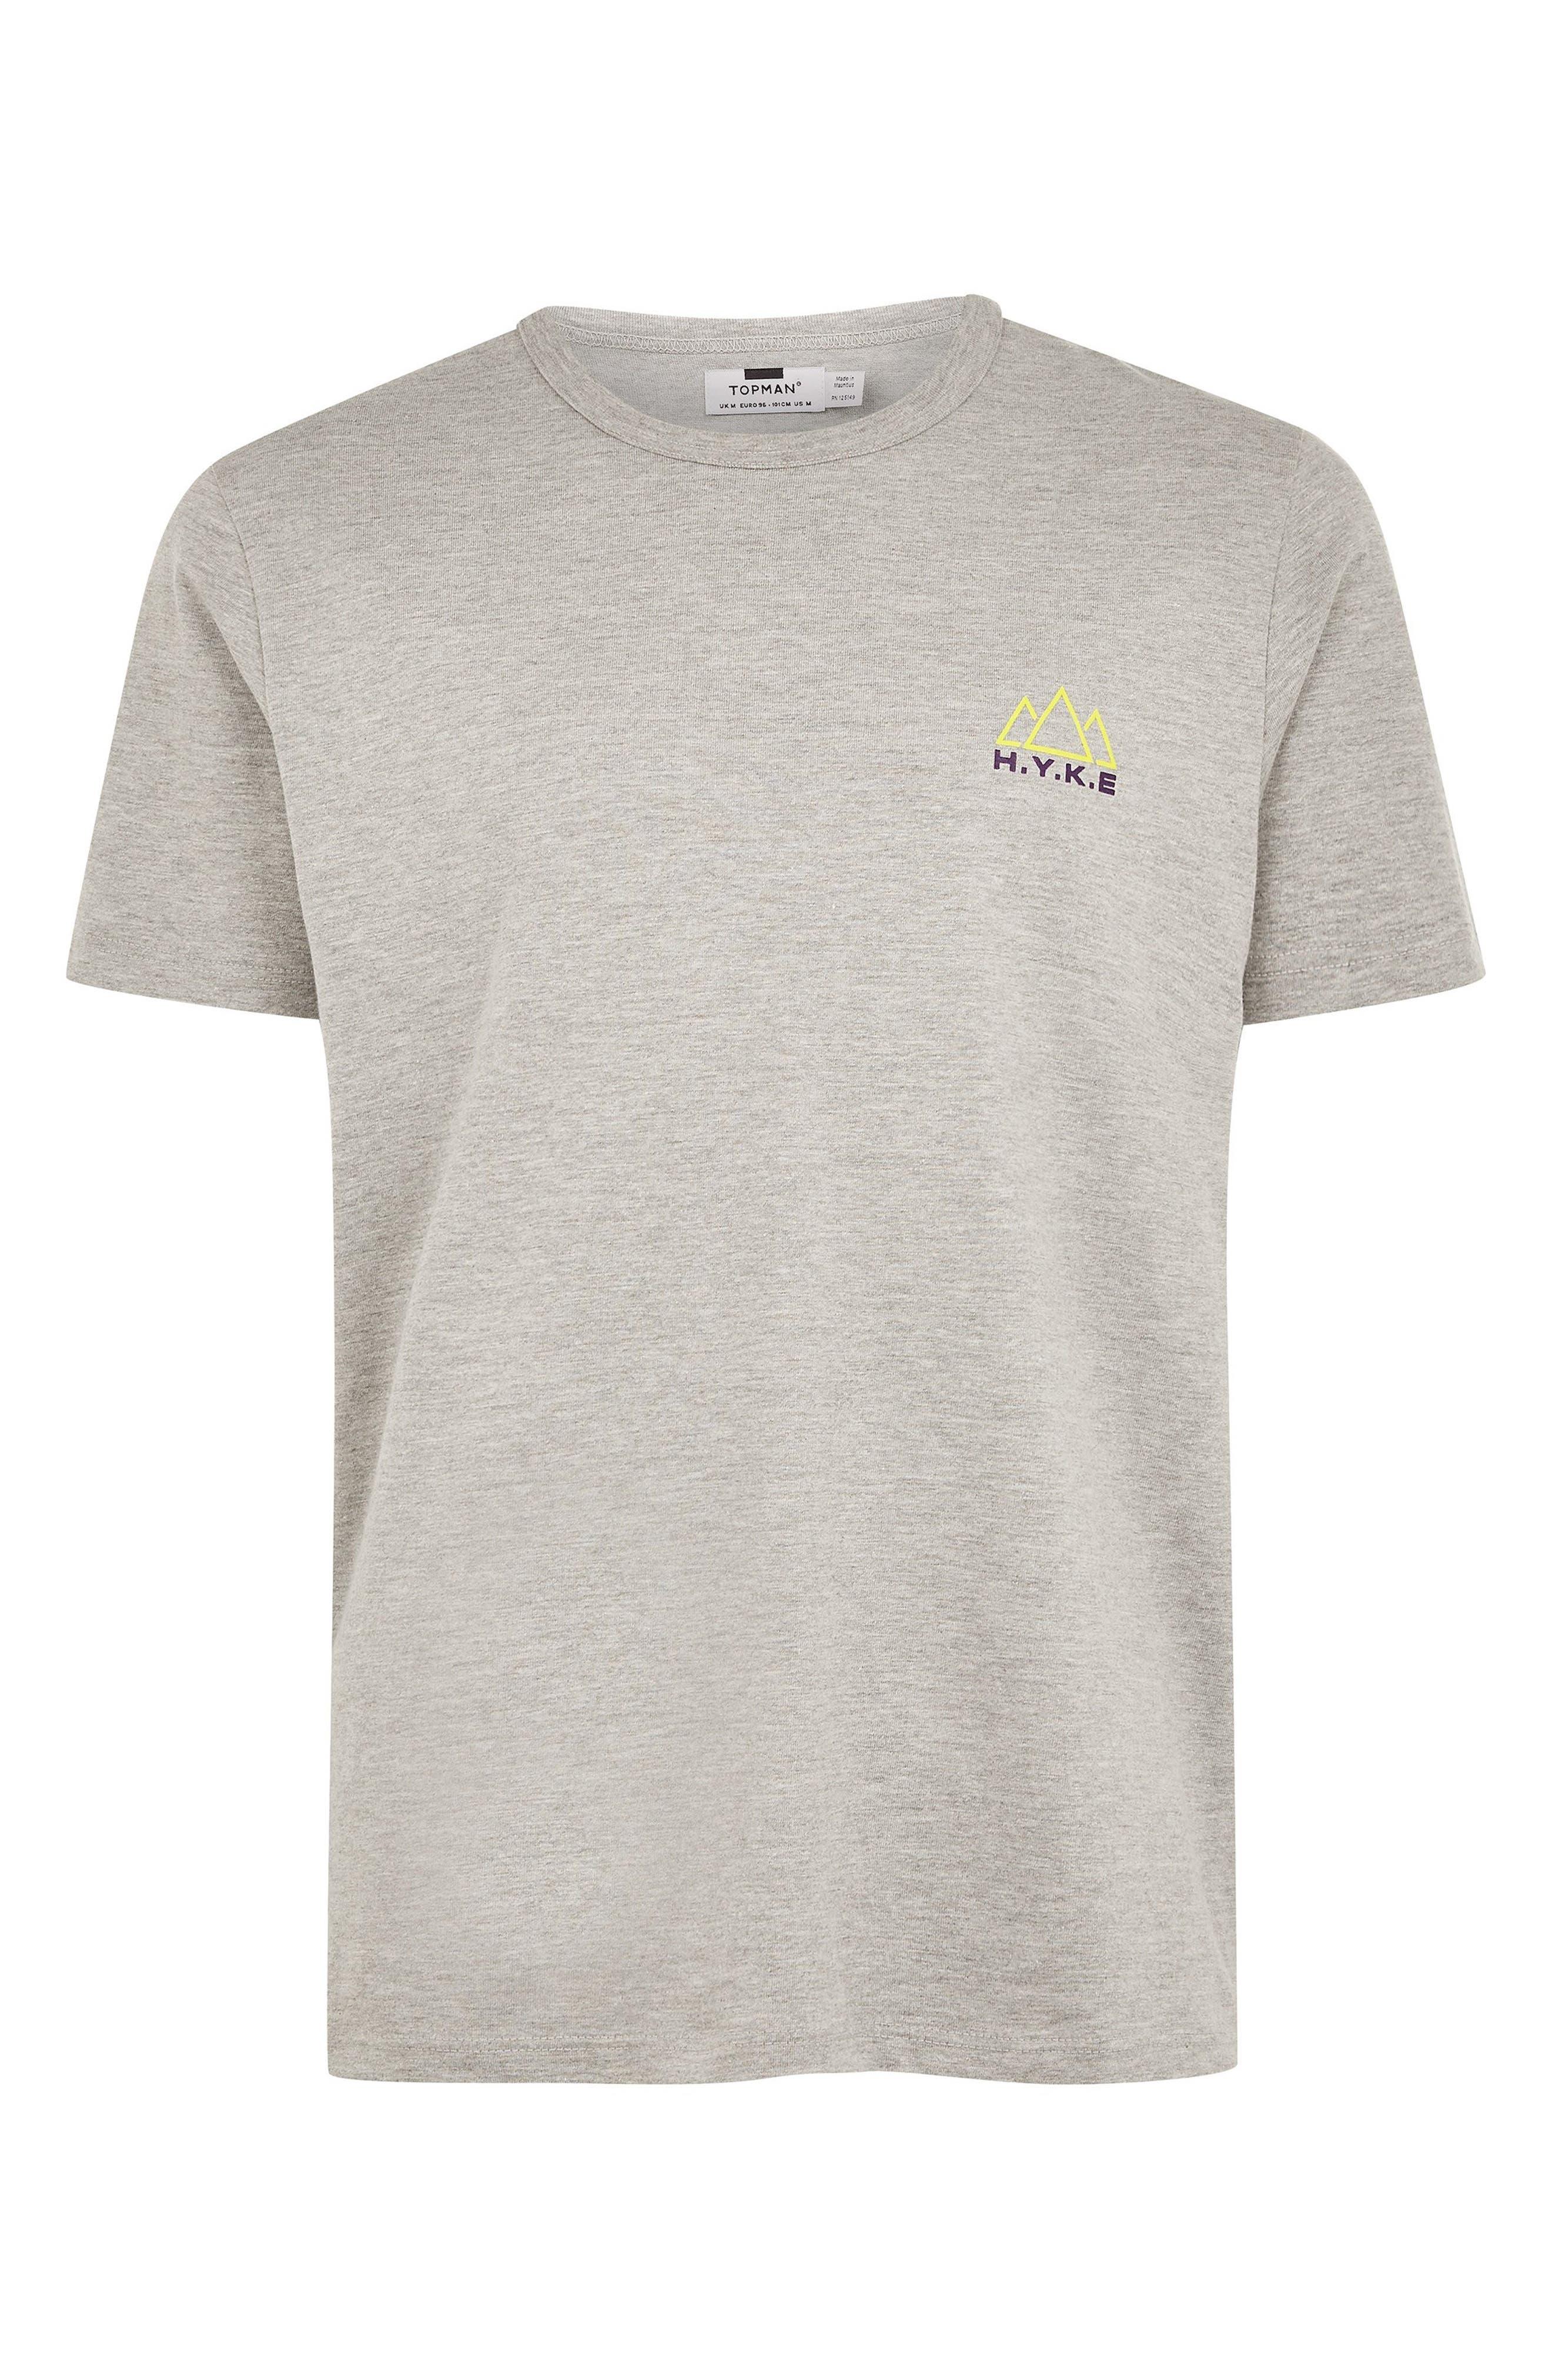 H.Y.K.E. Graphic T-Shirt,                             Alternate thumbnail 4, color,                             GREY